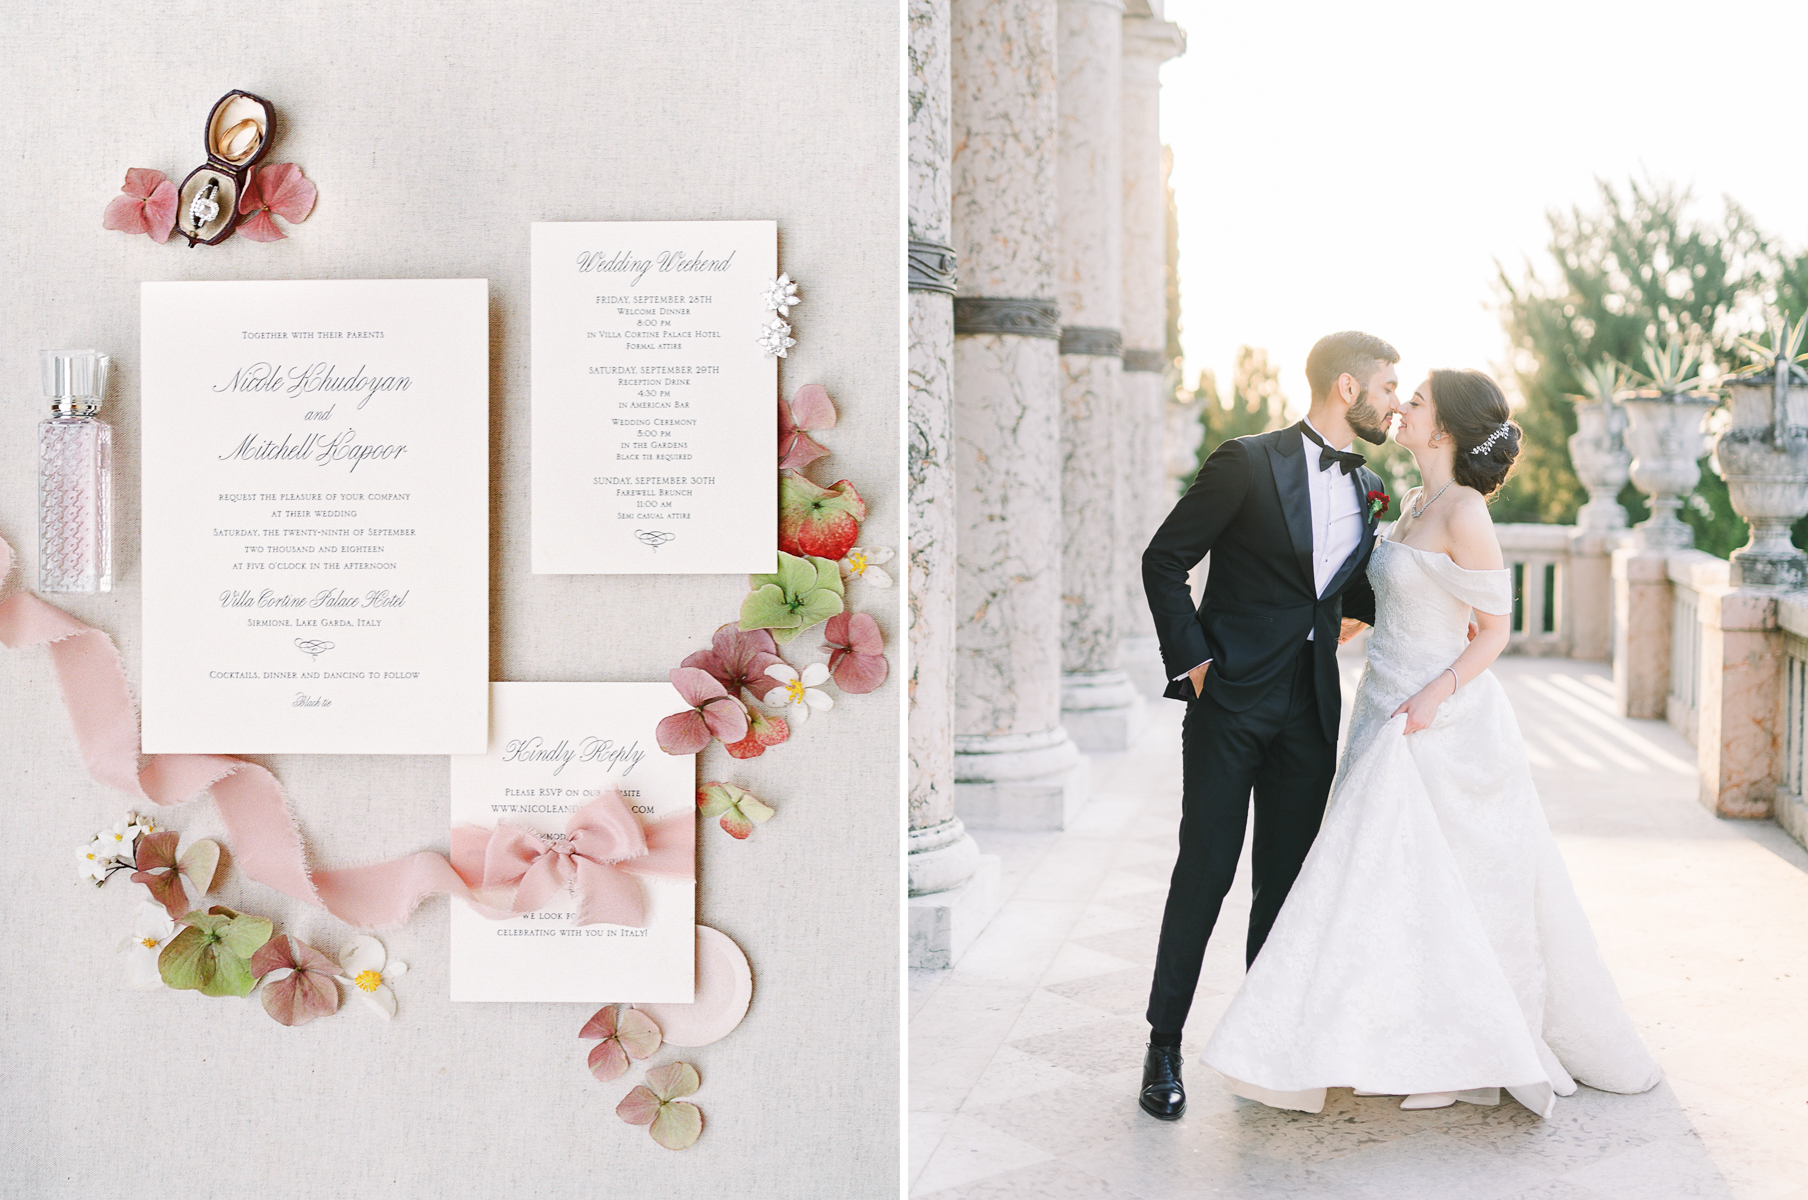 Palace_Villa_Cortine_Hotel_Italian_Wedding_Photographer_Sirmione_AKP-38-Nicole_Khudoyan_Mitchell_Kapoor.jpg